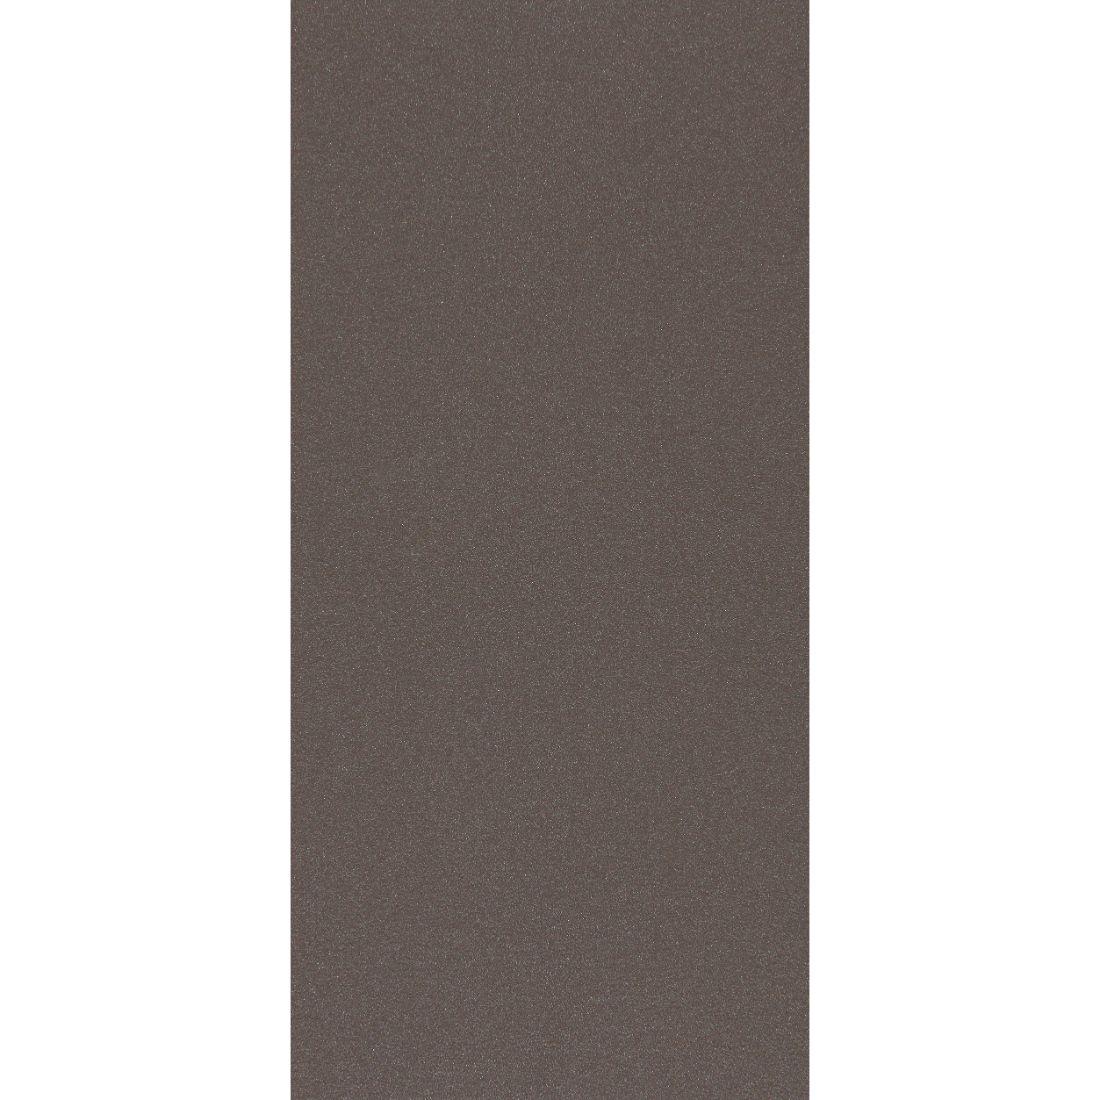 Specialty Wall Lining Panel Magic Mushroom 2700 x 1200 x 4.5mm